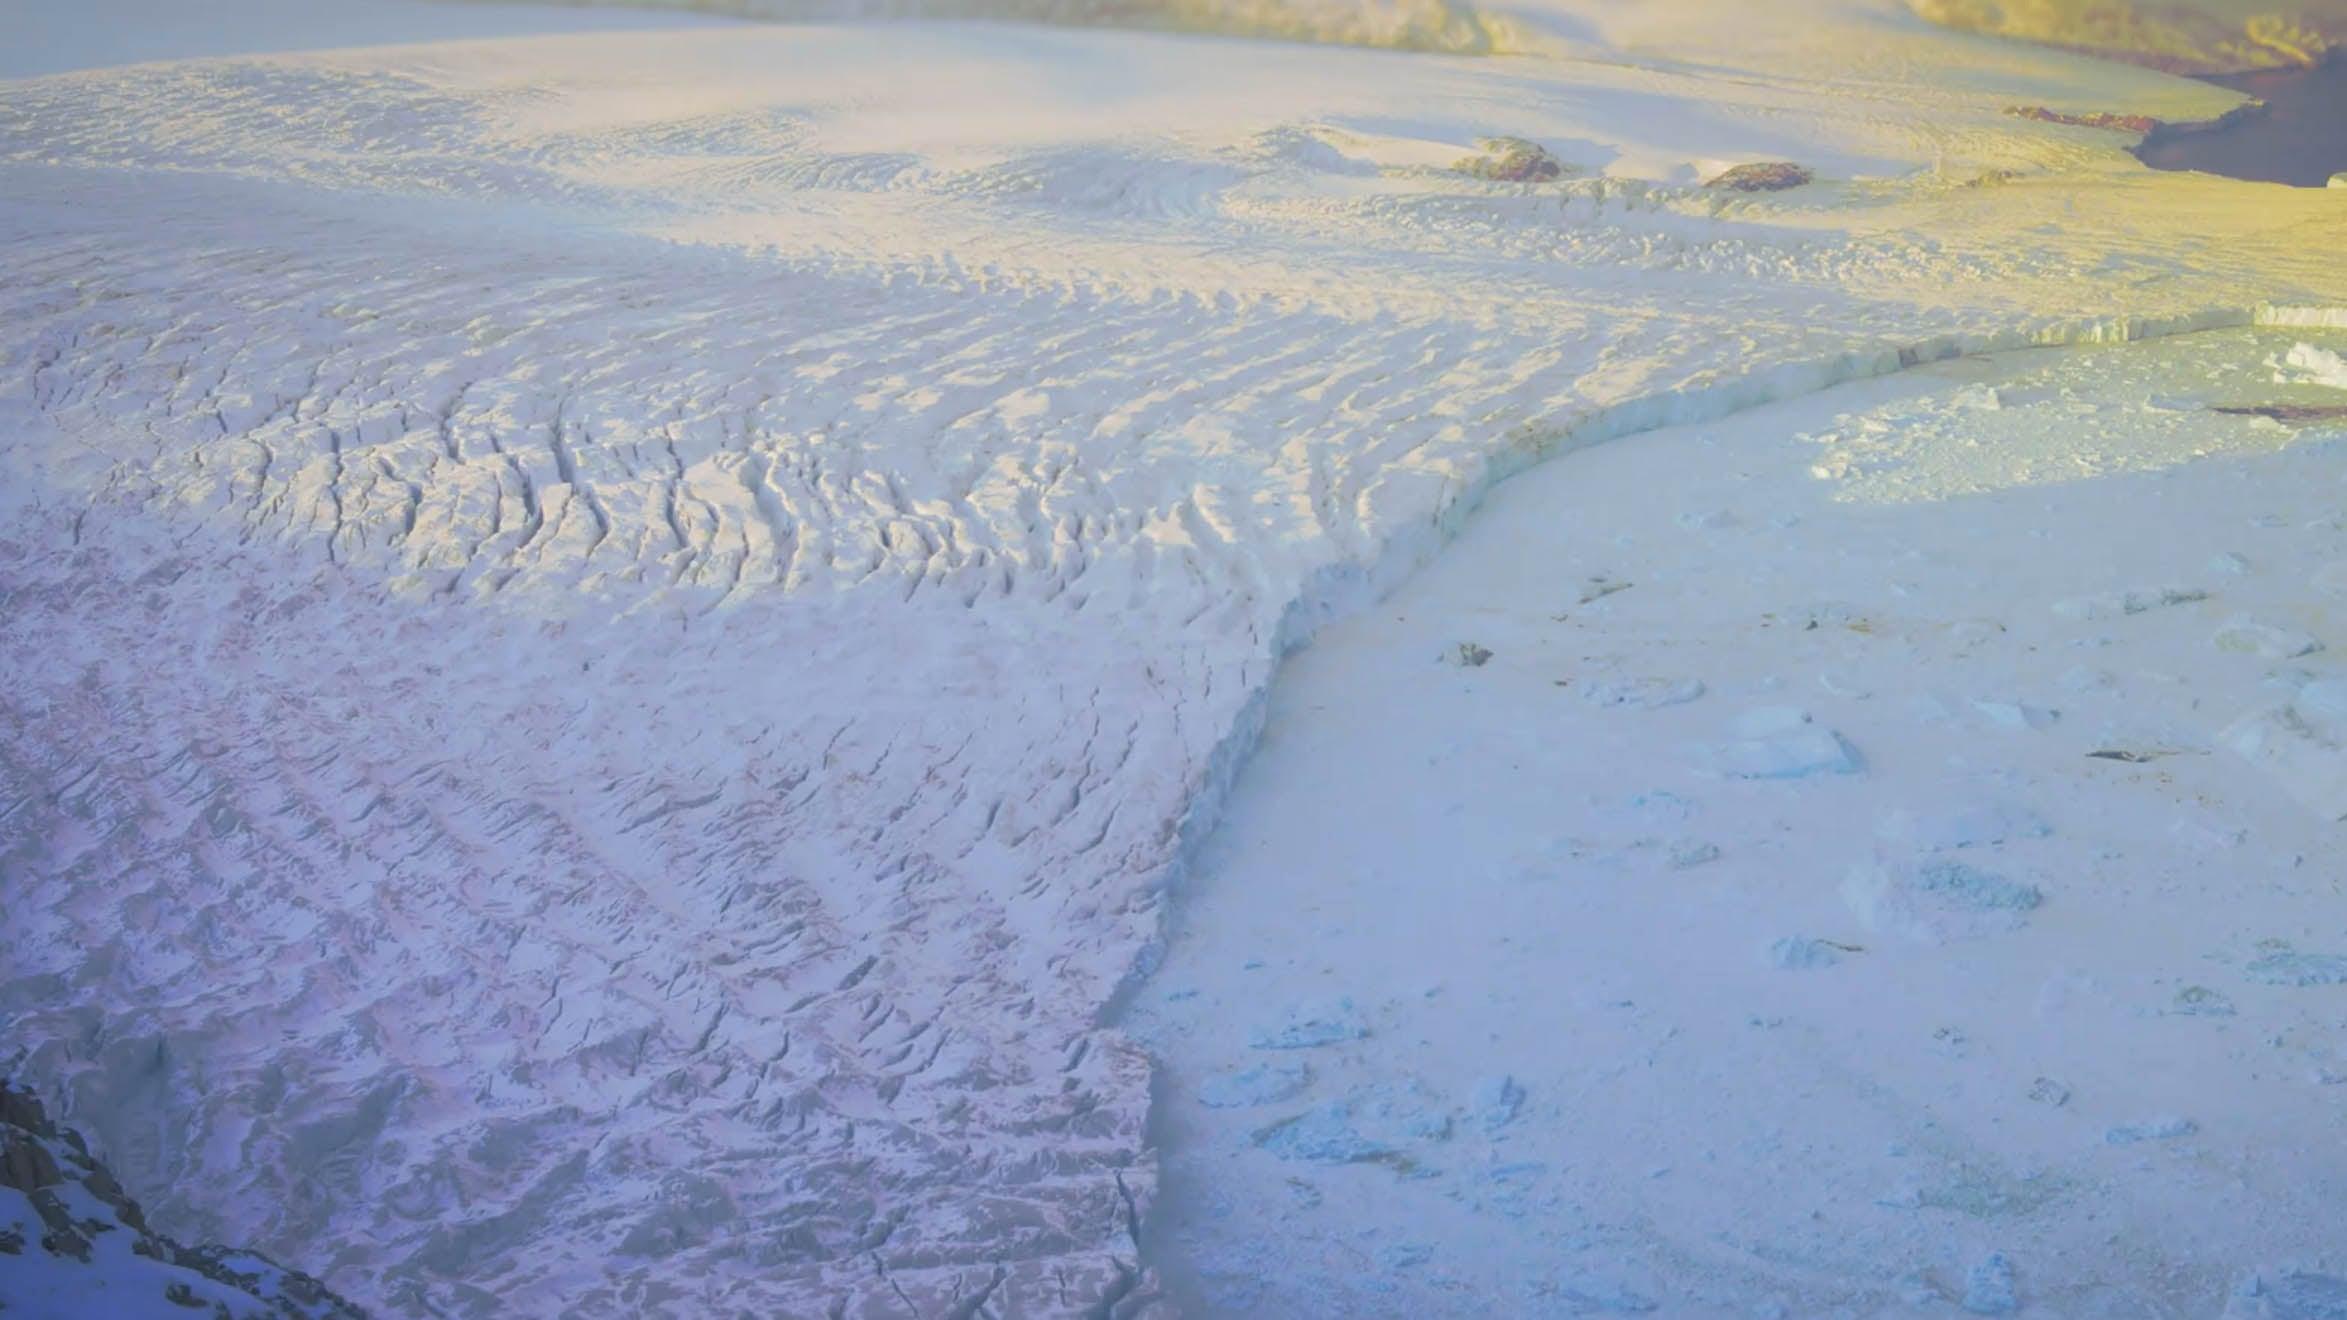 Watch Glacier Melt in 60 Seconds